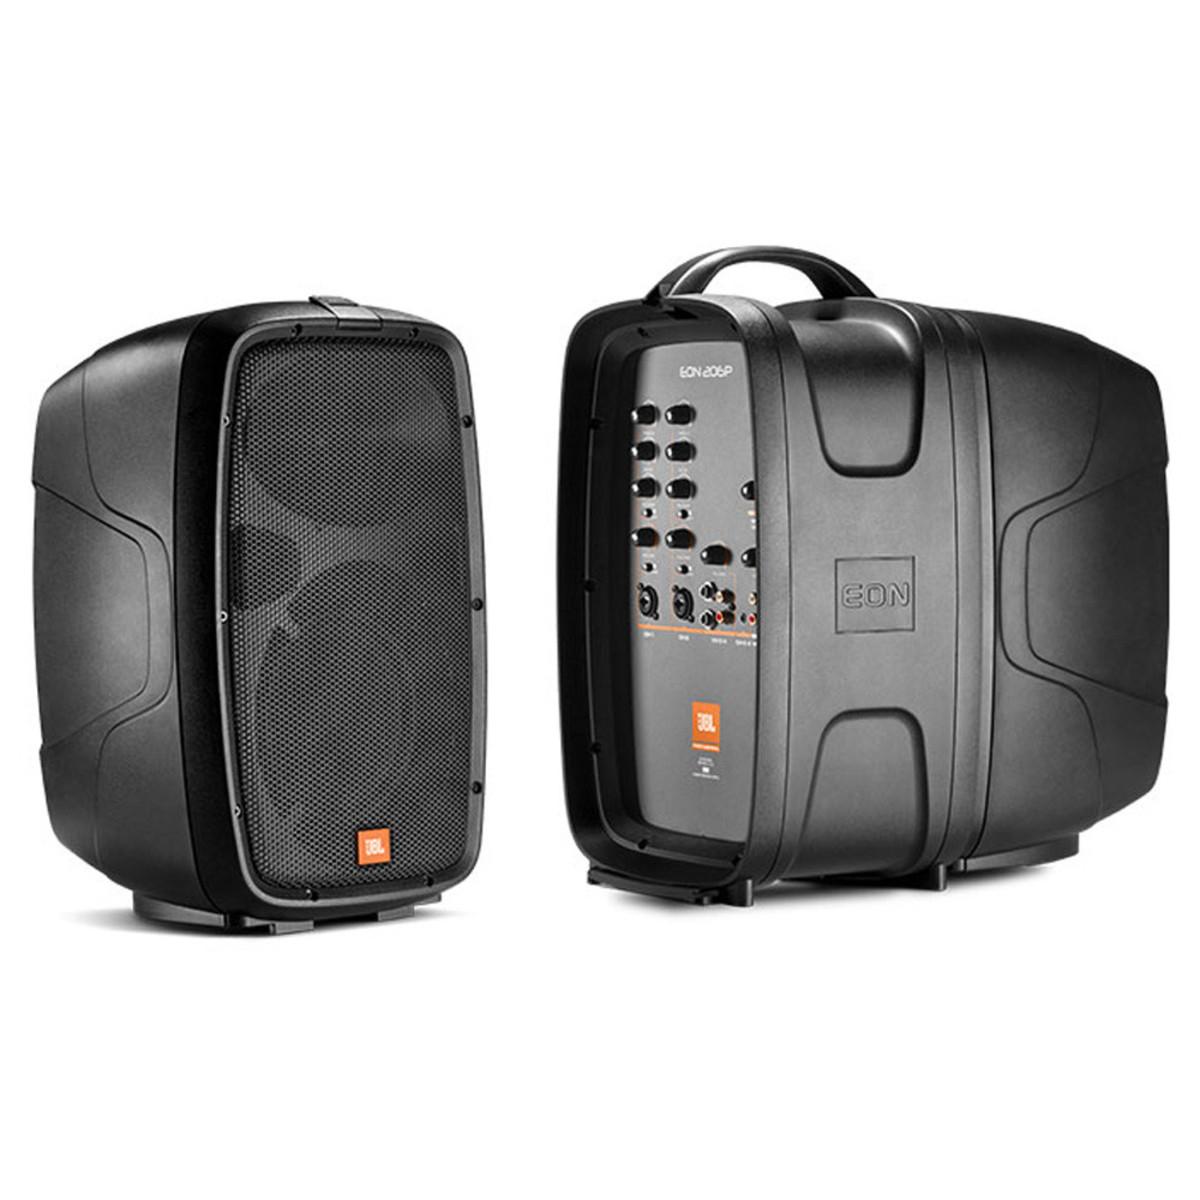 jbl eon206p portable pa system at gear4music. Black Bedroom Furniture Sets. Home Design Ideas